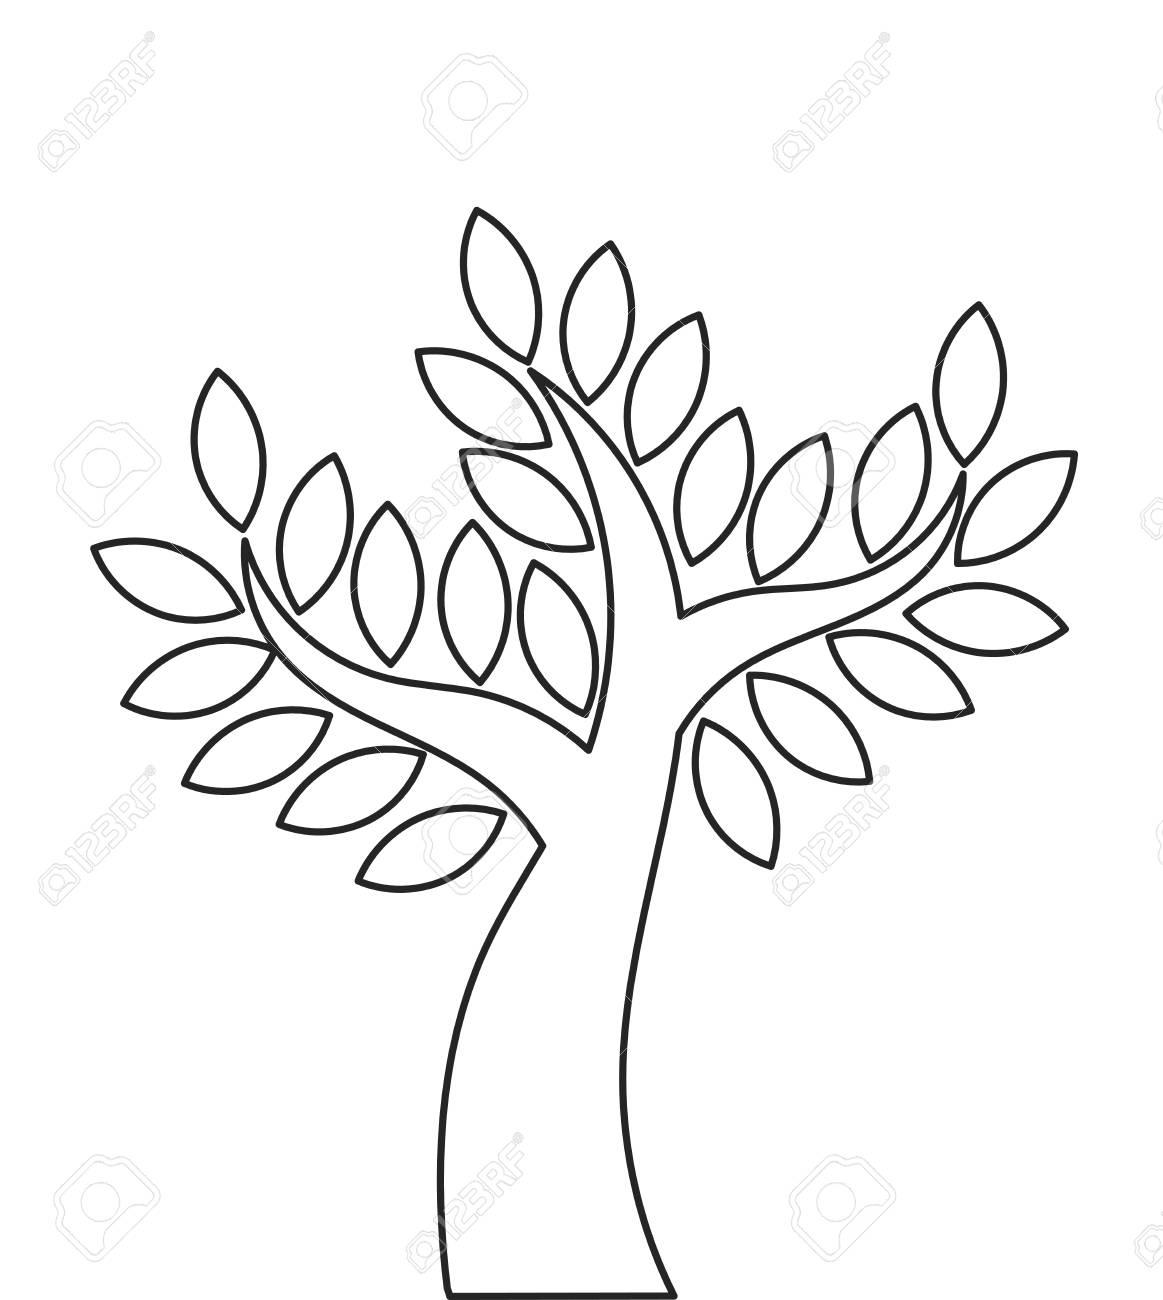 transparent tree outline shape vector illustration royalty free